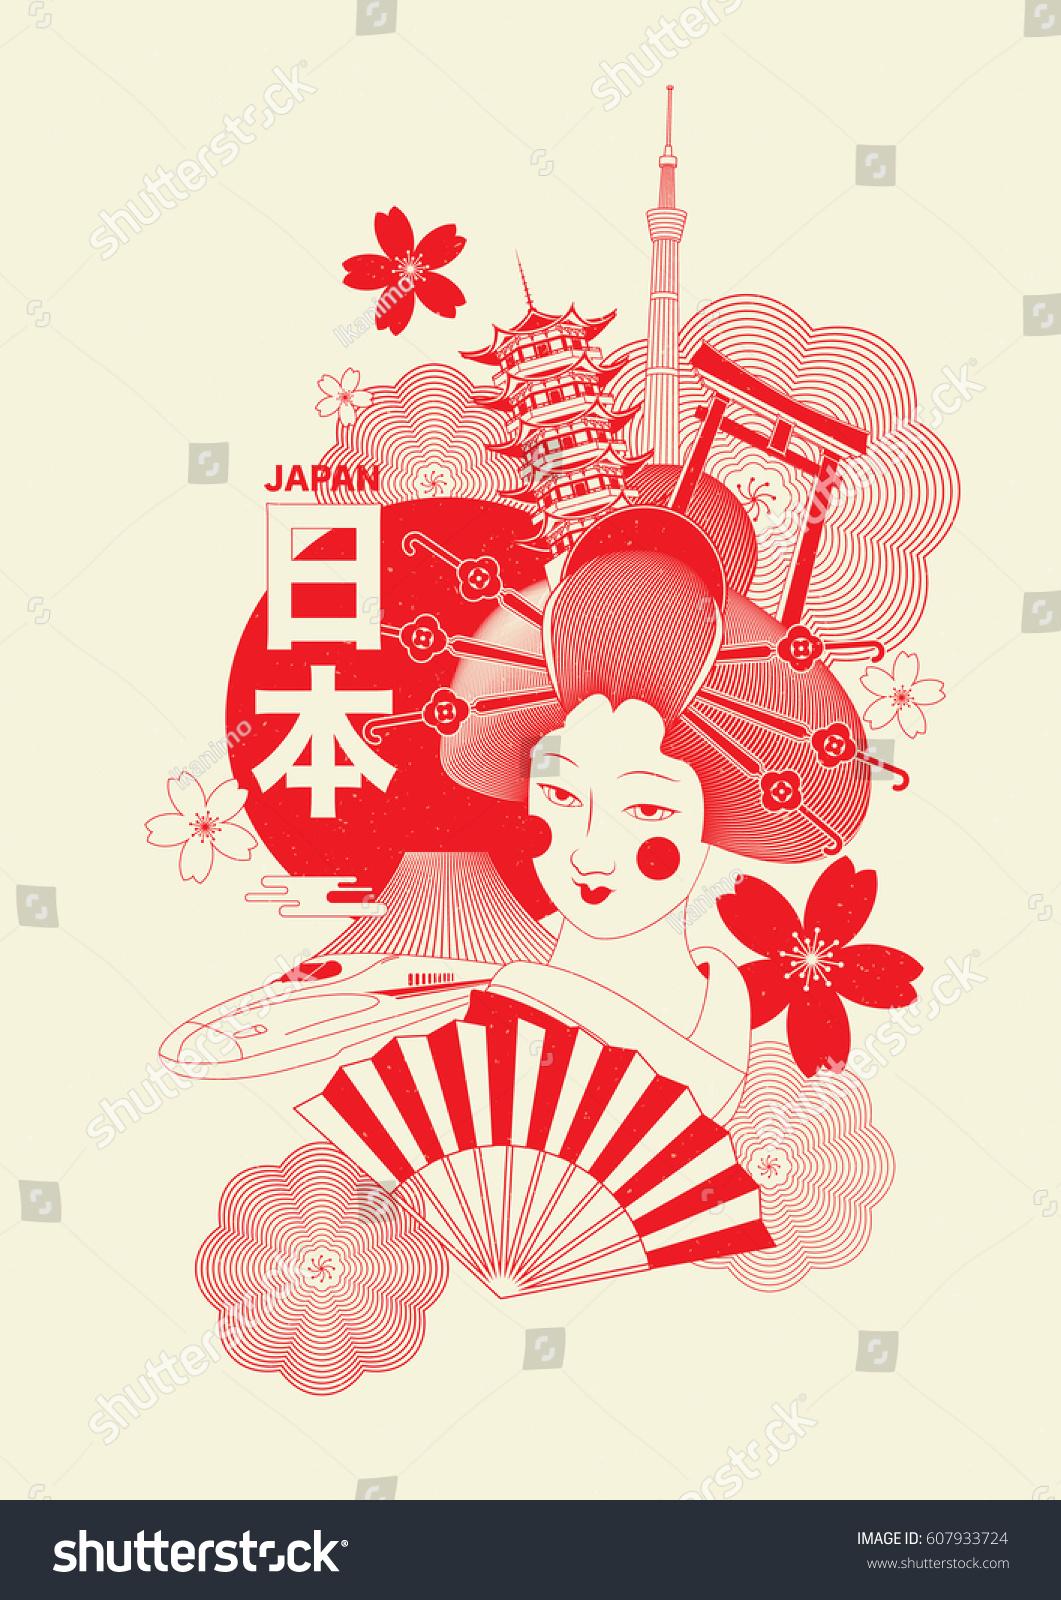 japan travel brochure template - japan tourism posterbrochure template japanese character